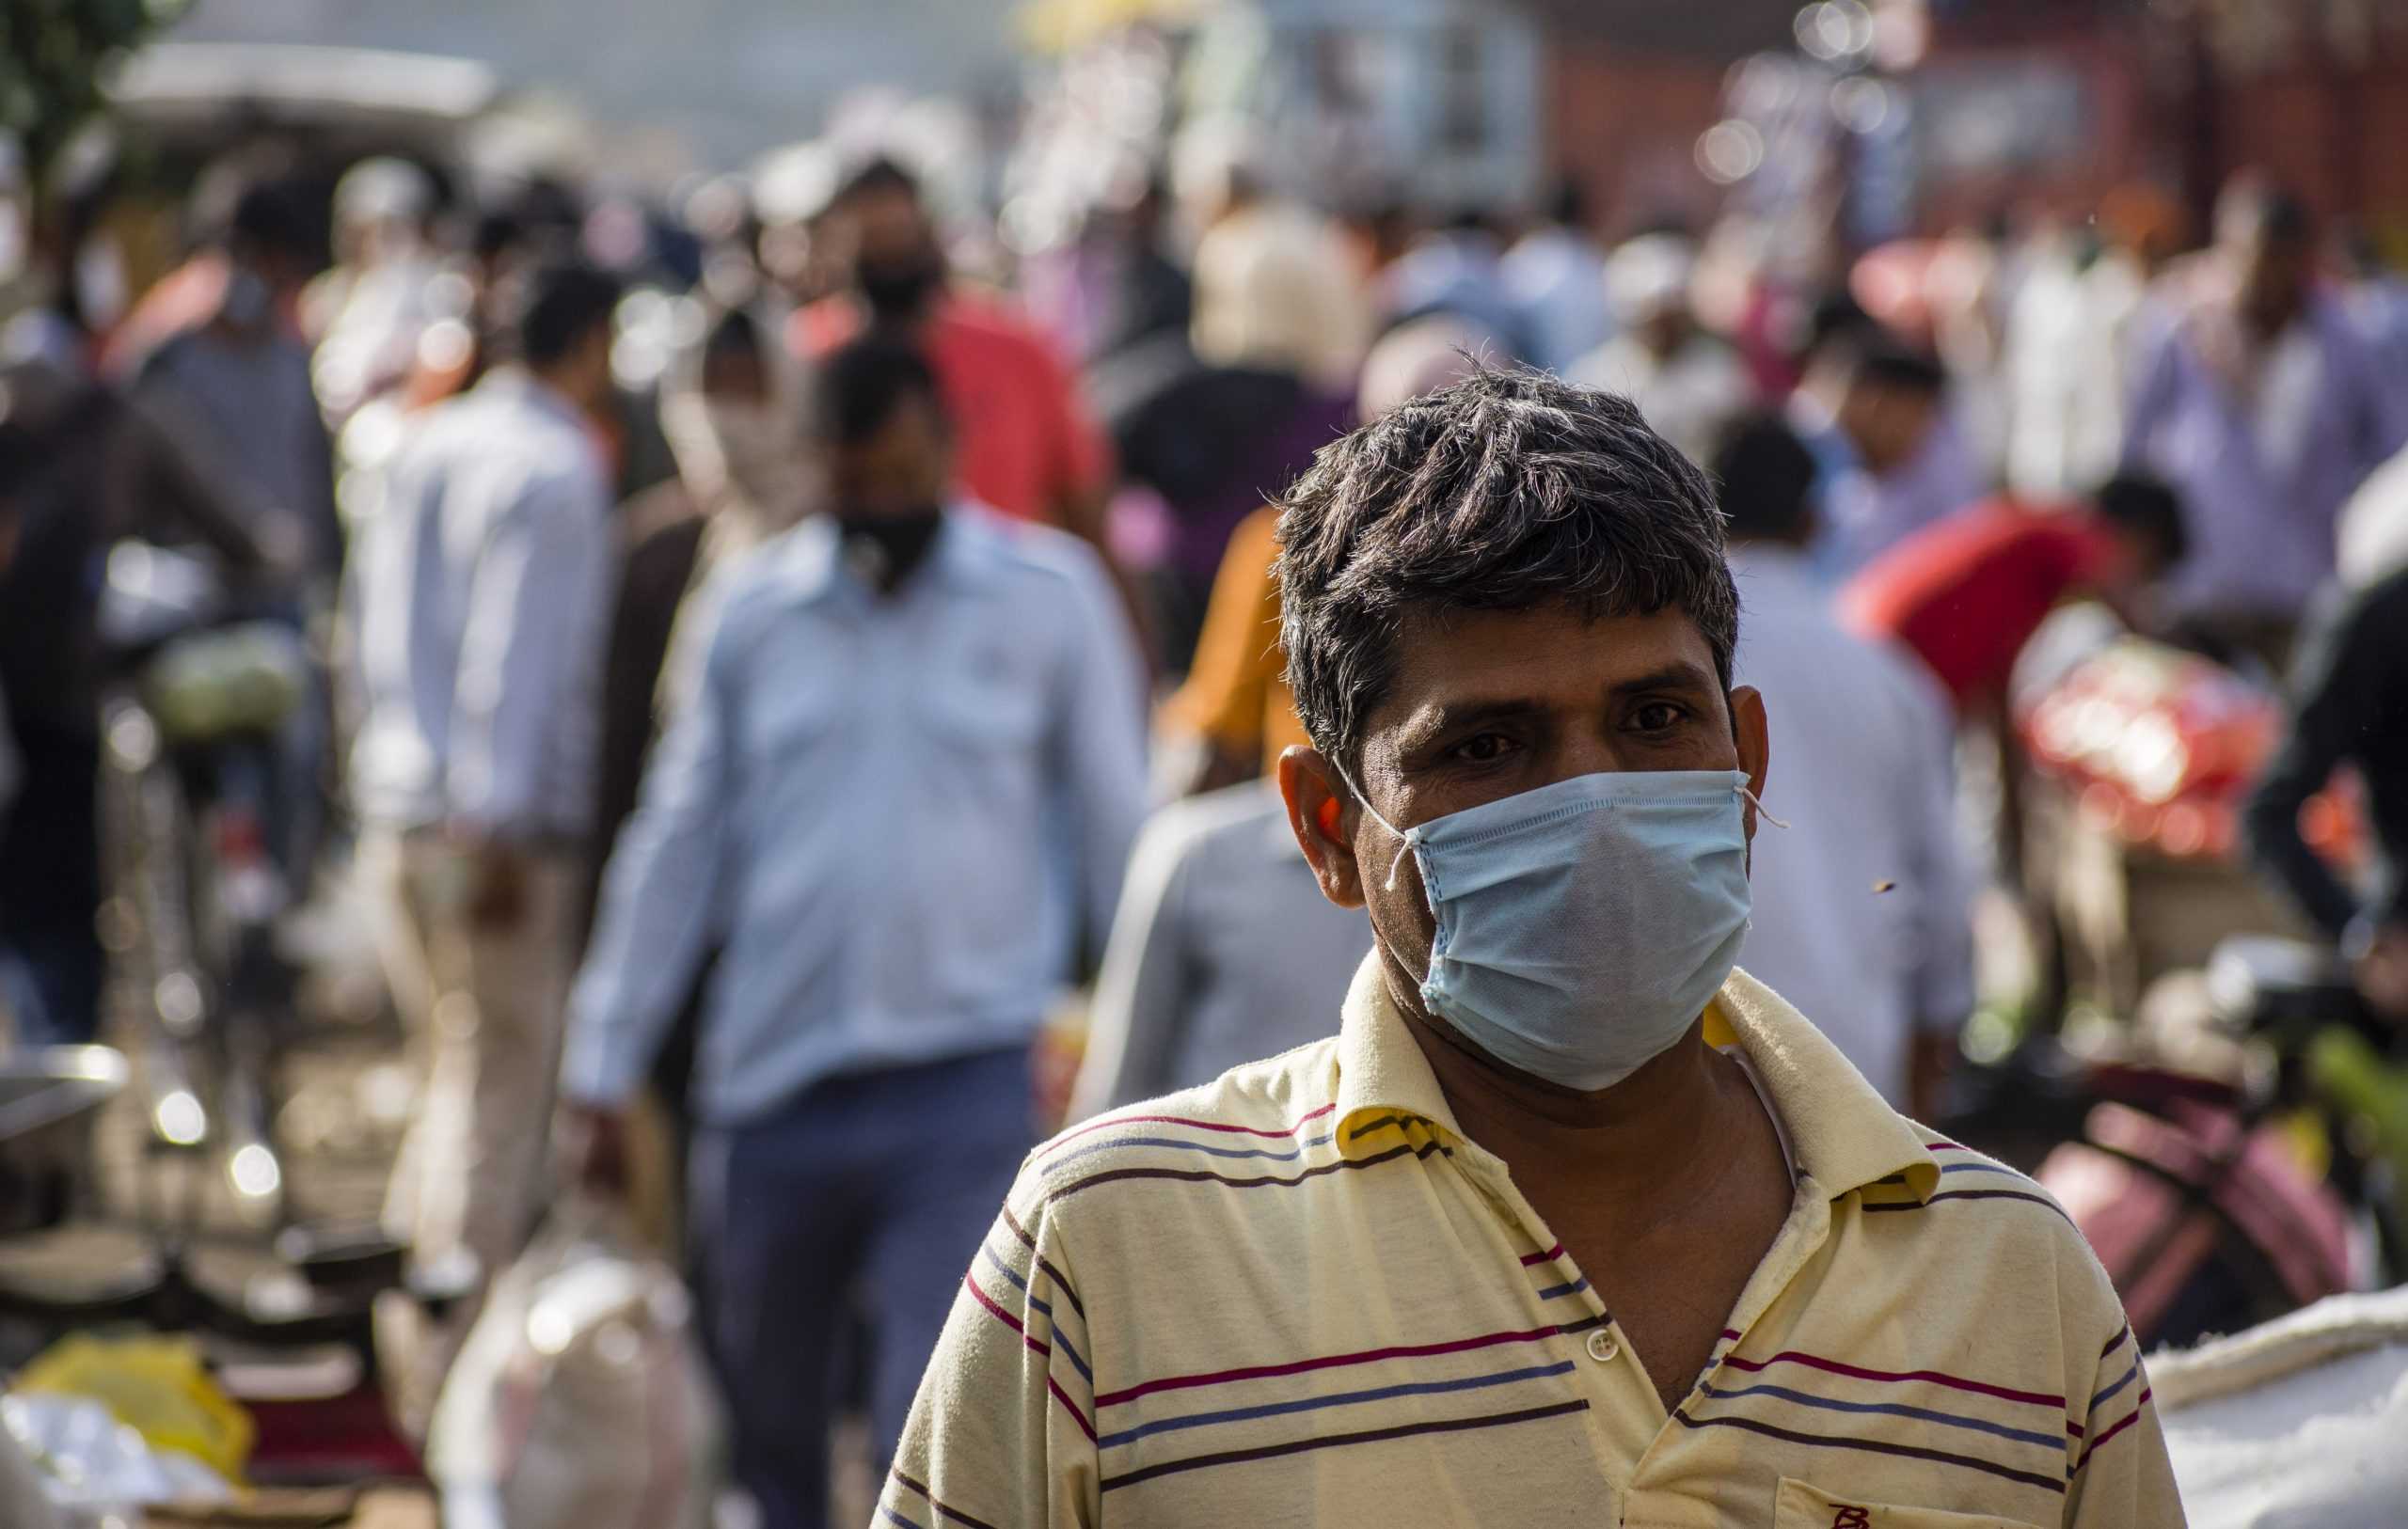 Major Indian cities make mask-wearing compulsory amid virus fears ...